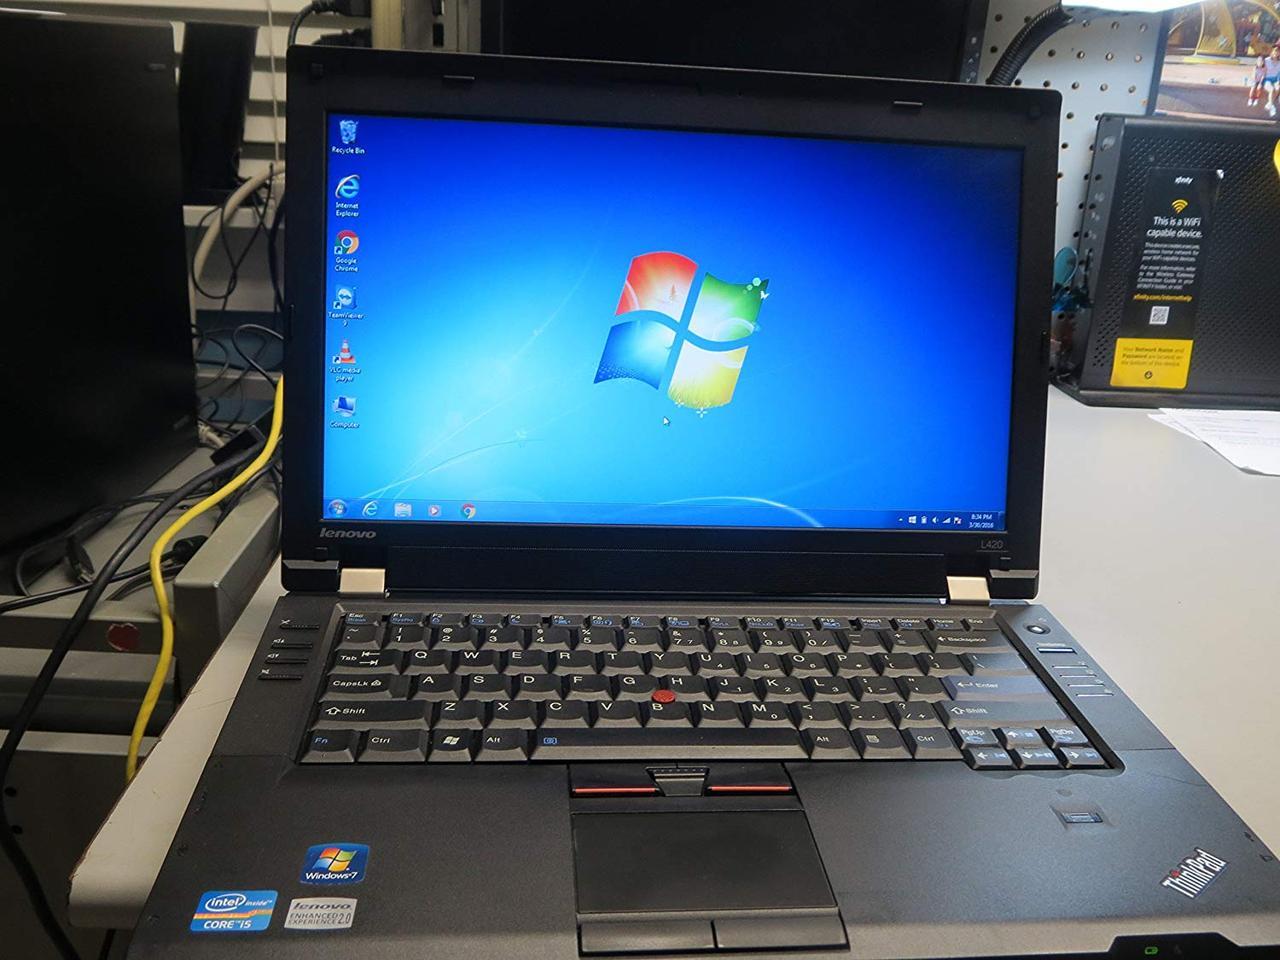 Ноутбук, notebook, Lenovo ThinkPad L420, 4 ядра, 4 Гб ОЗУ, HDD 160 Гб